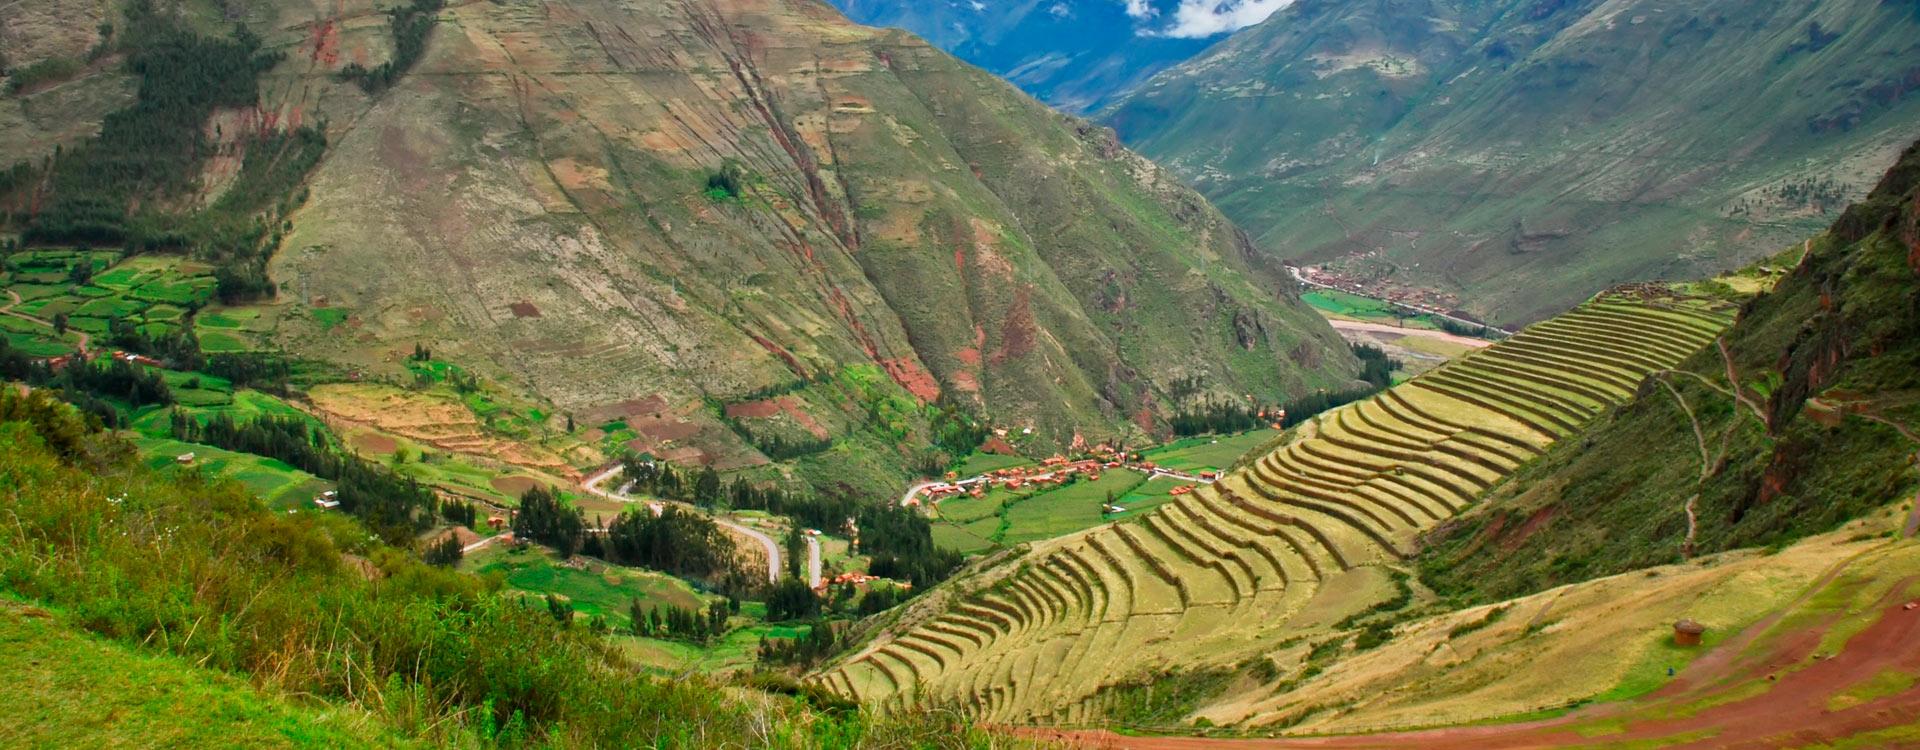 Sacred Valley Tour – Full Day